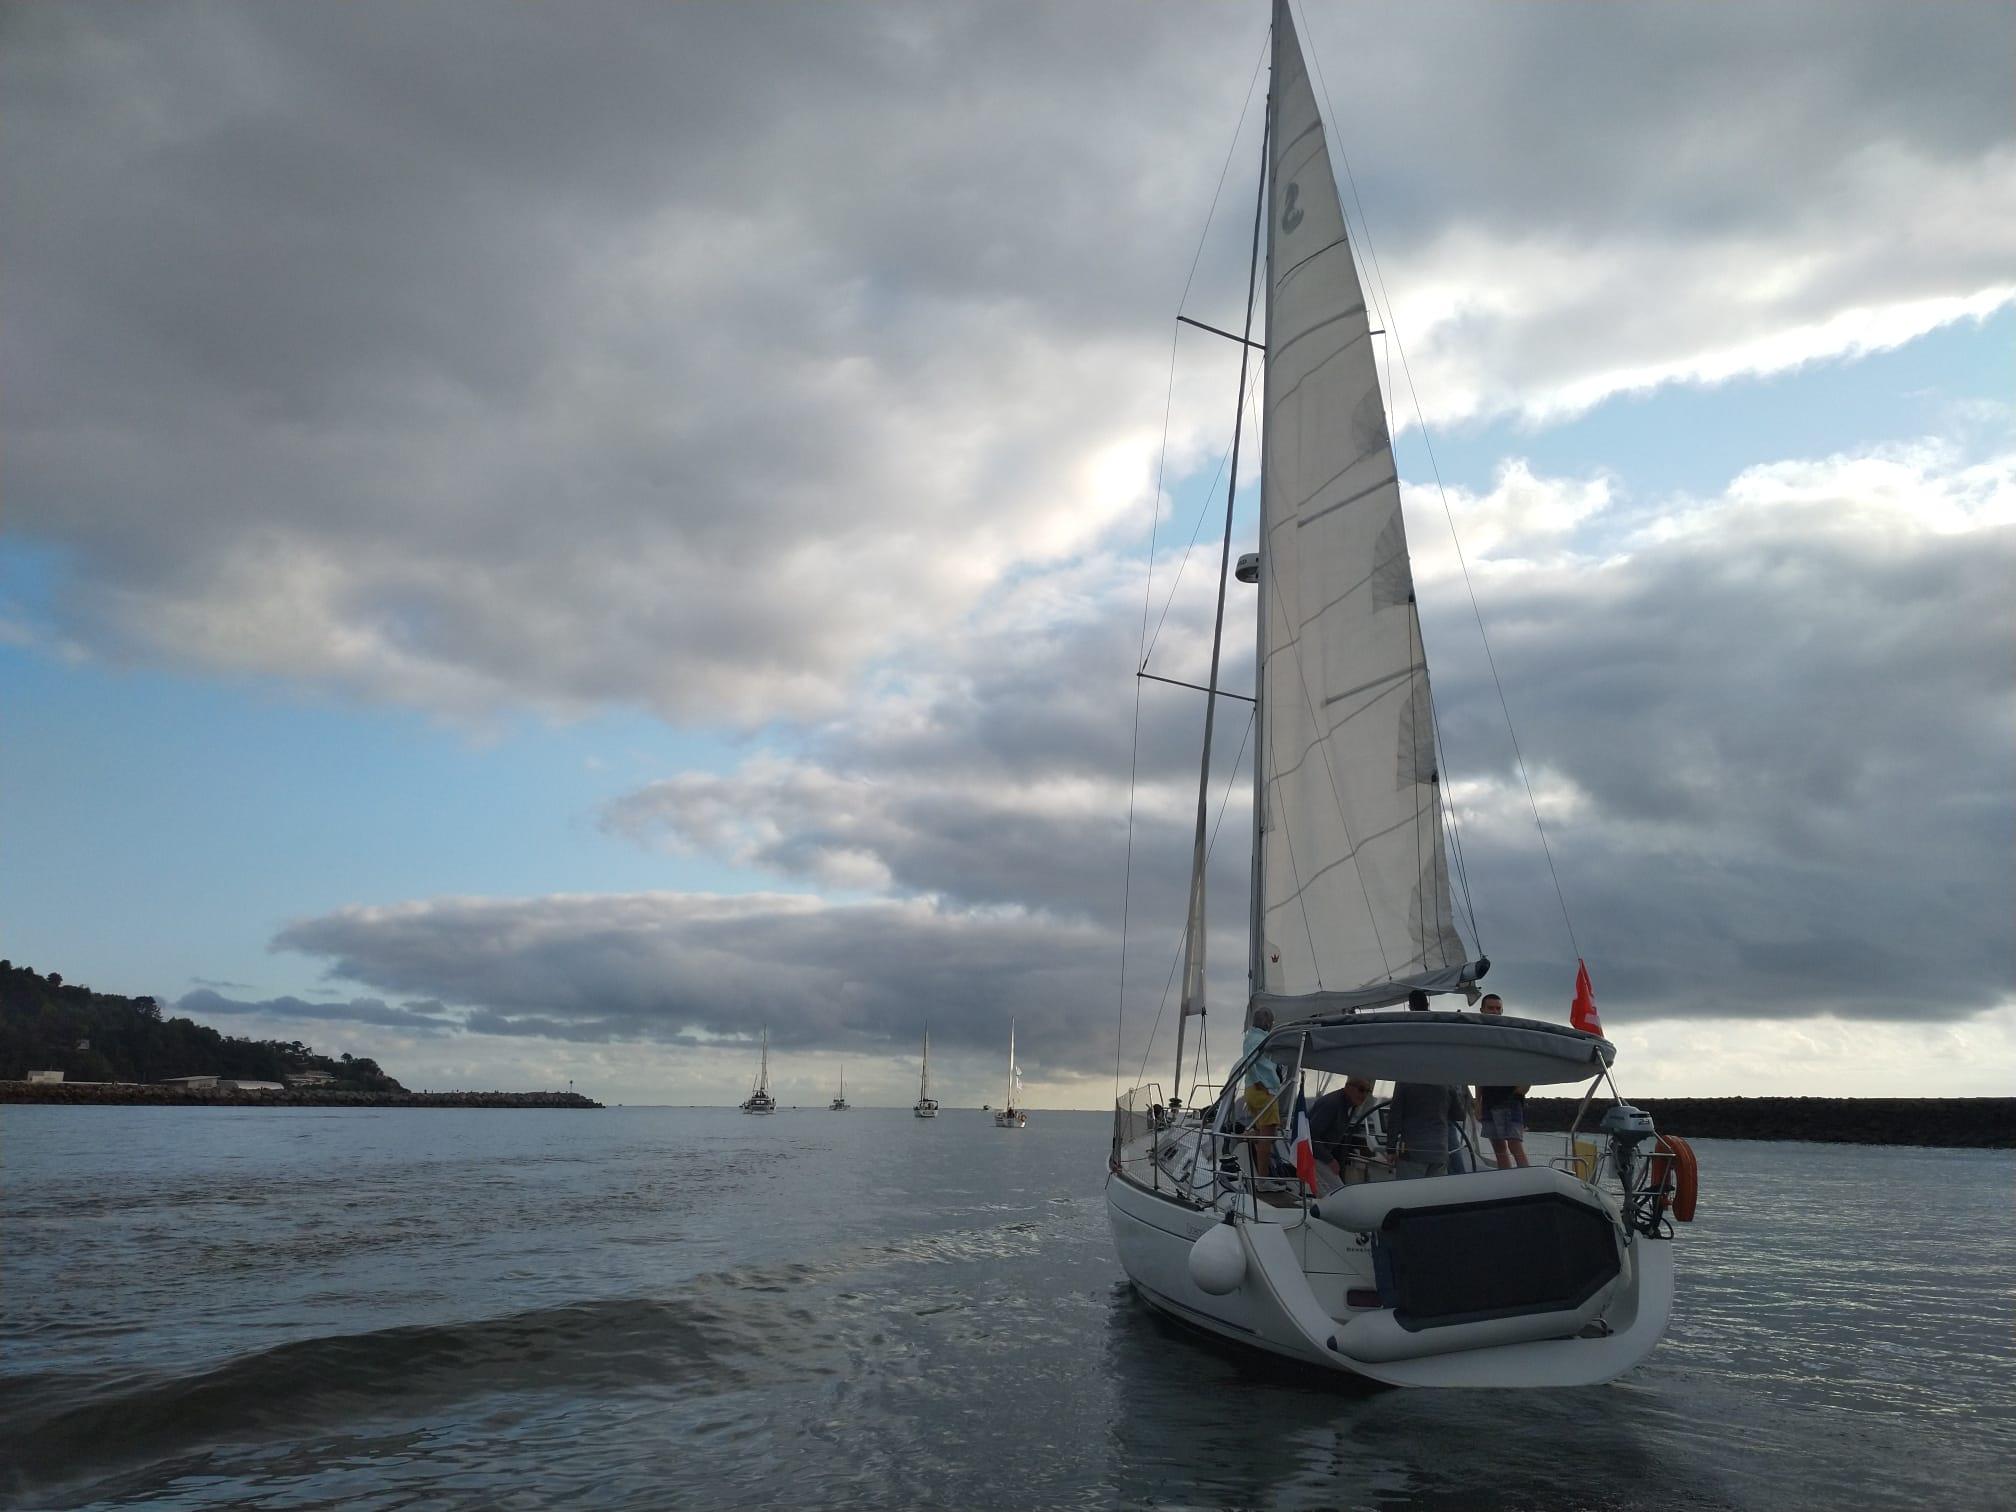 Salida de la flotilla esta mañana desde el puerto de Hondarribia. Foto: Sail the Way